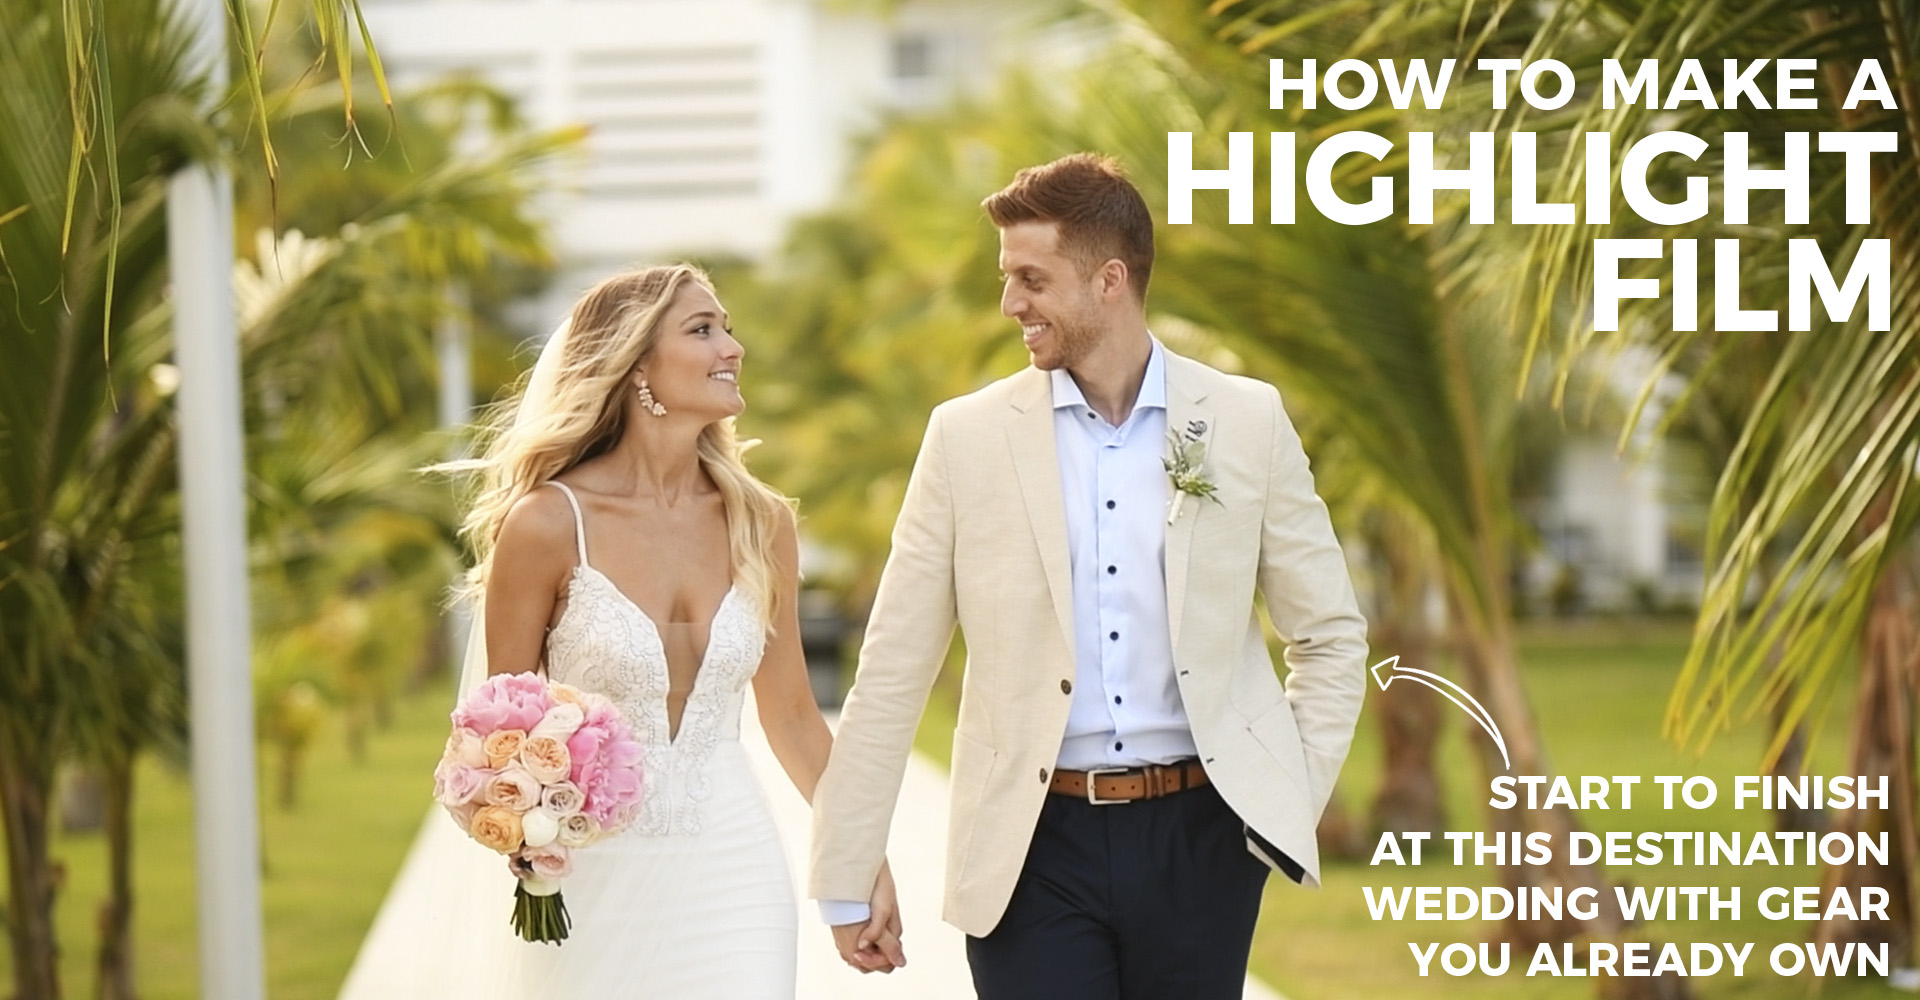 https://taylorjackson.podia.com/how-to-make-a-wedding-highlight-film